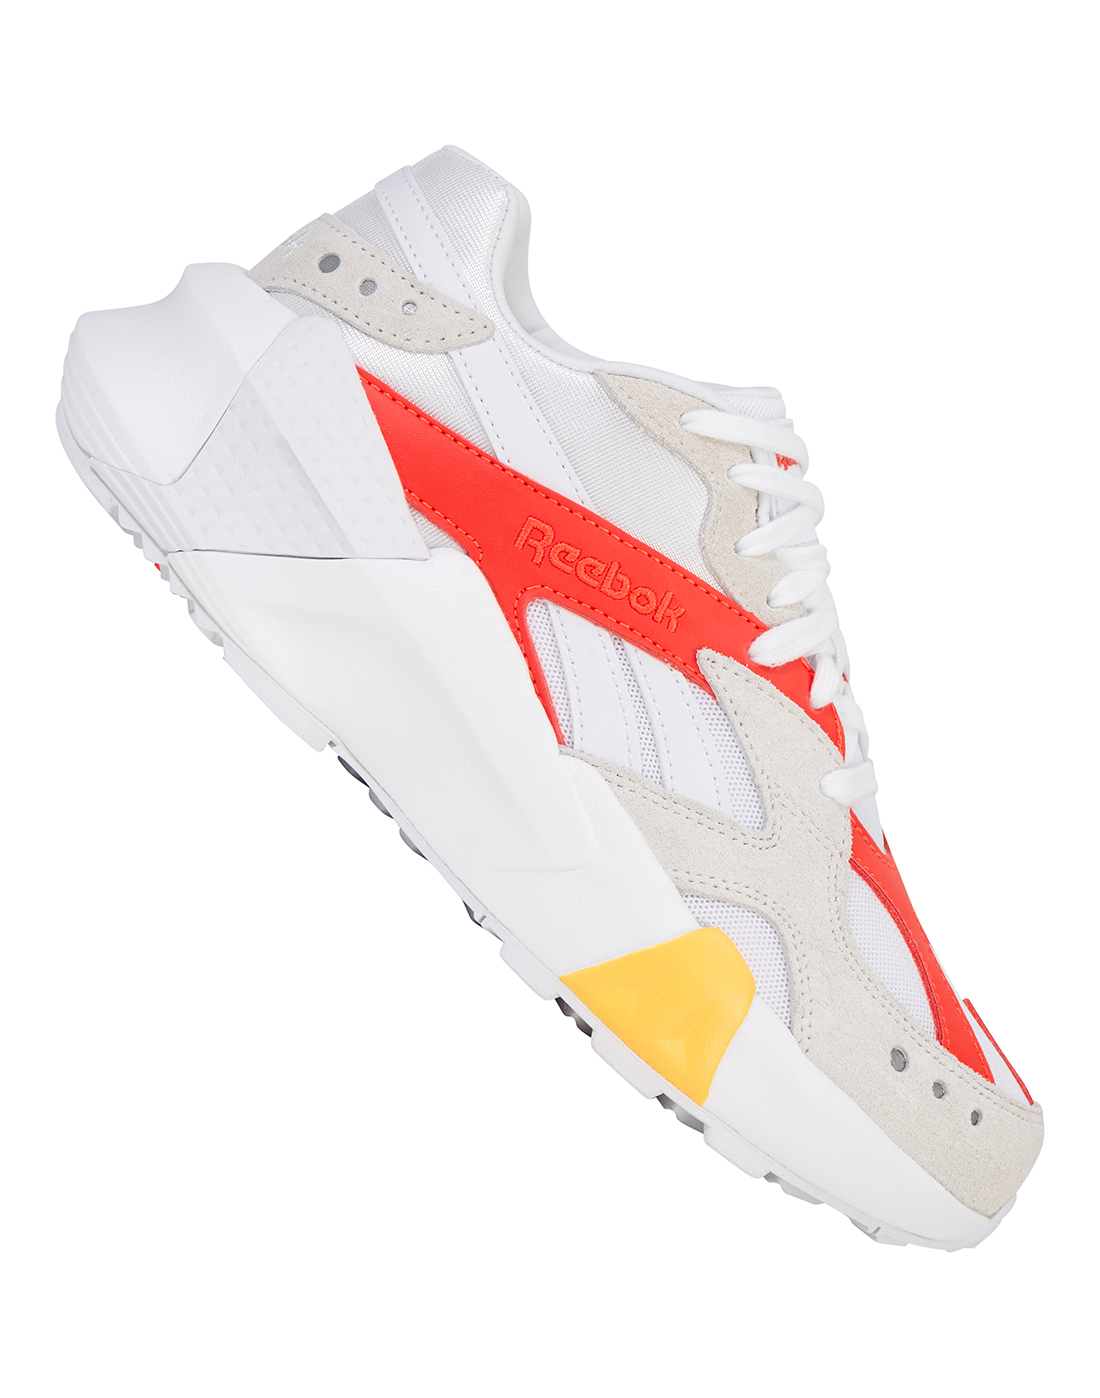 8de8cafc58a White   Orange Reebok Gigi Hadid Trainers Aztrek